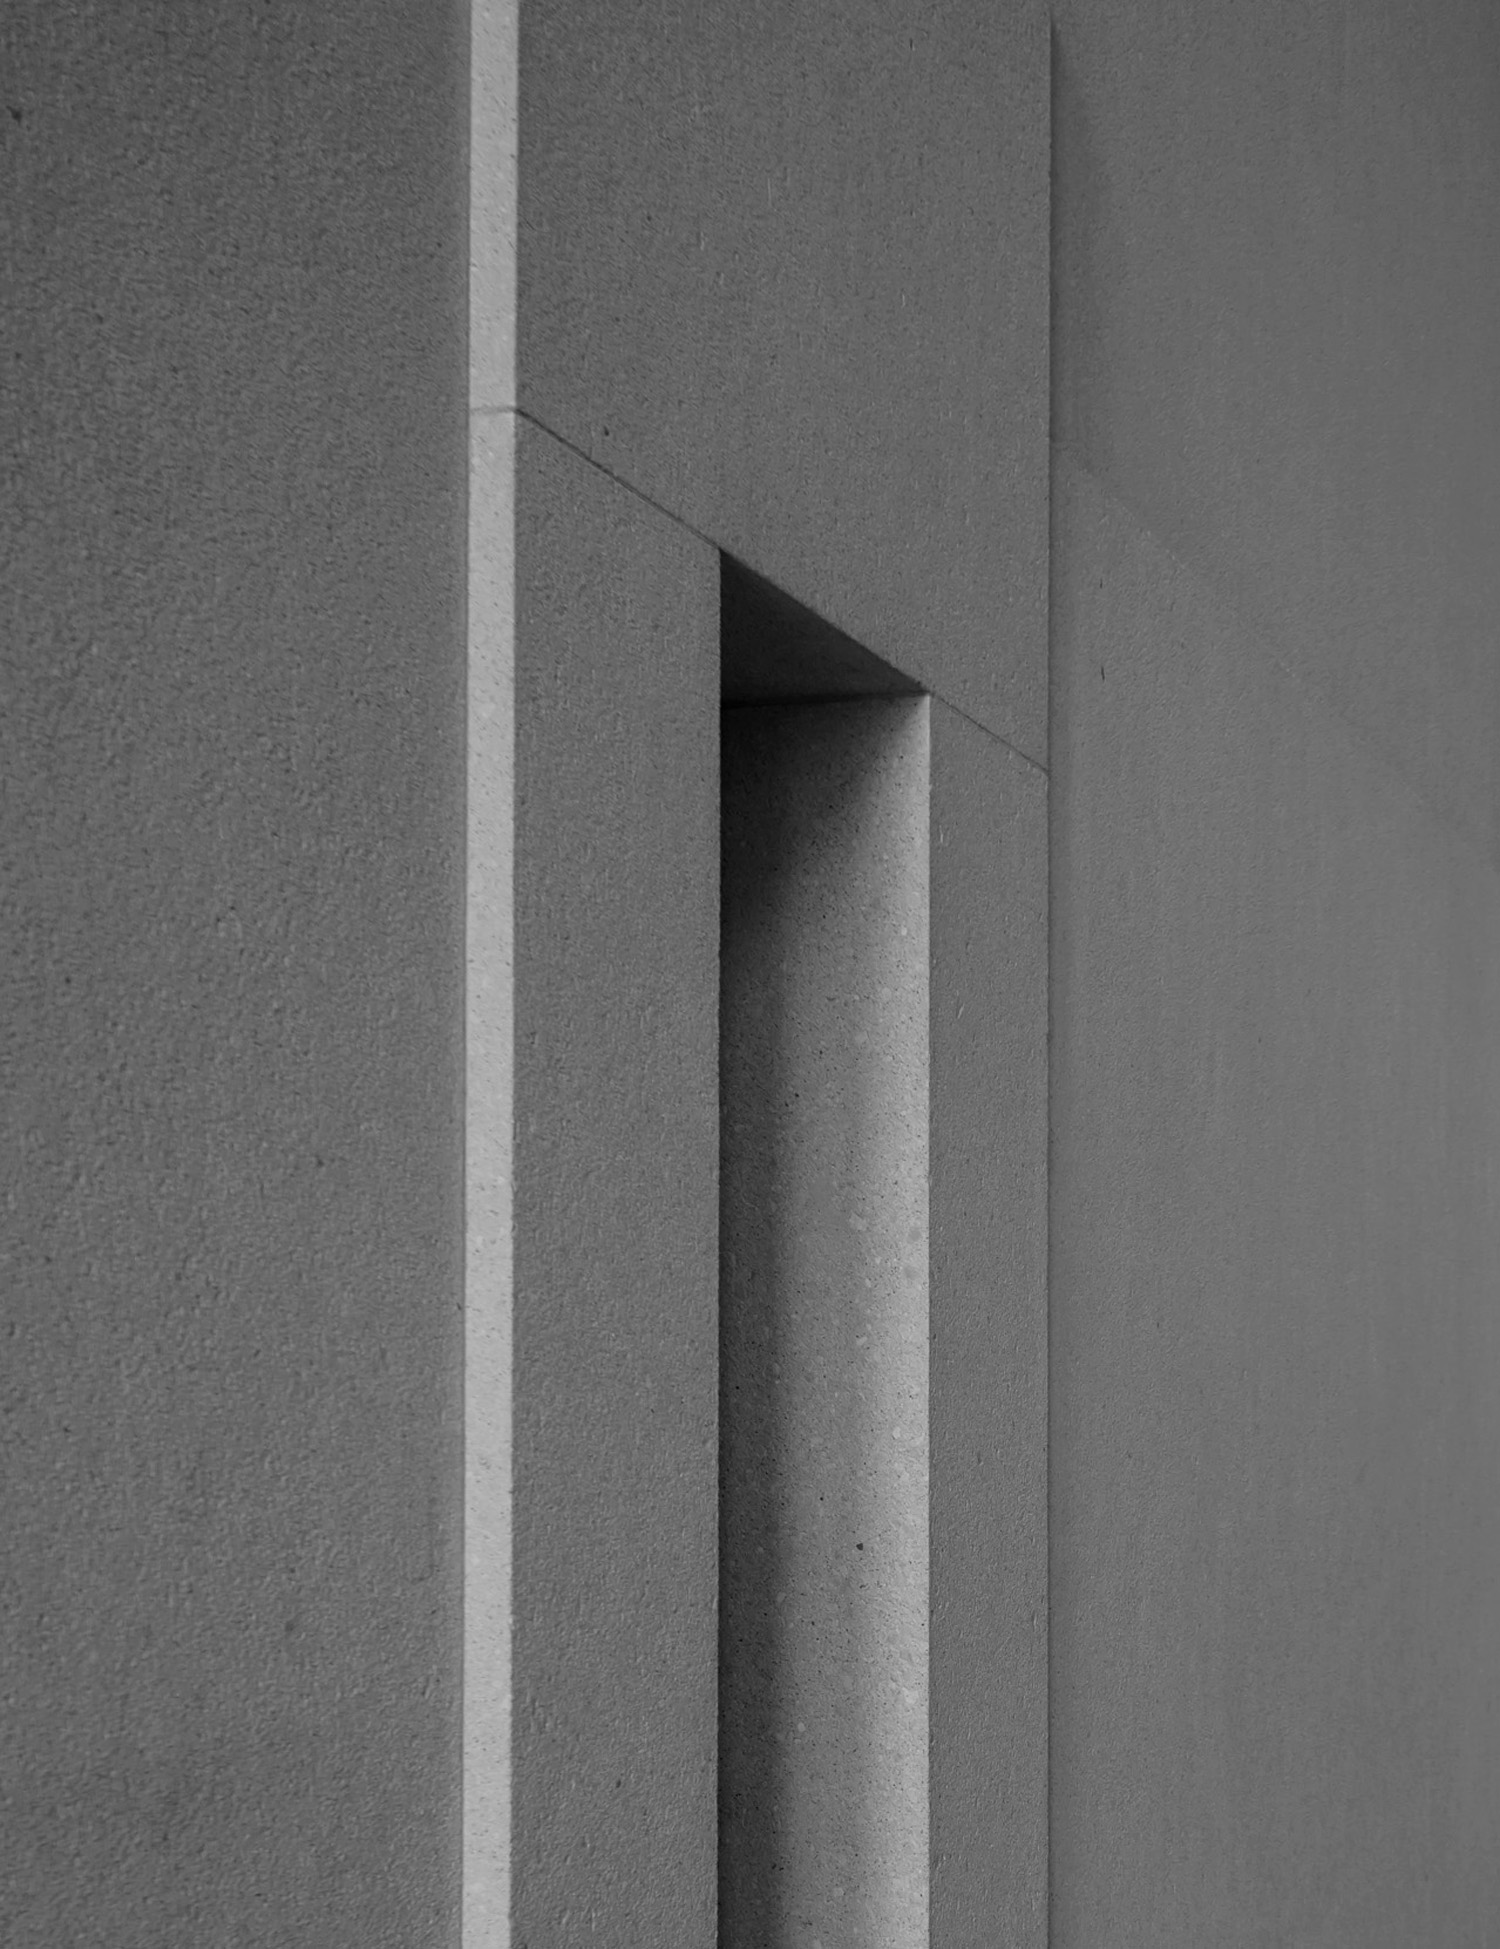 Emily-Grundon_architecture_spaces_0005.jpg